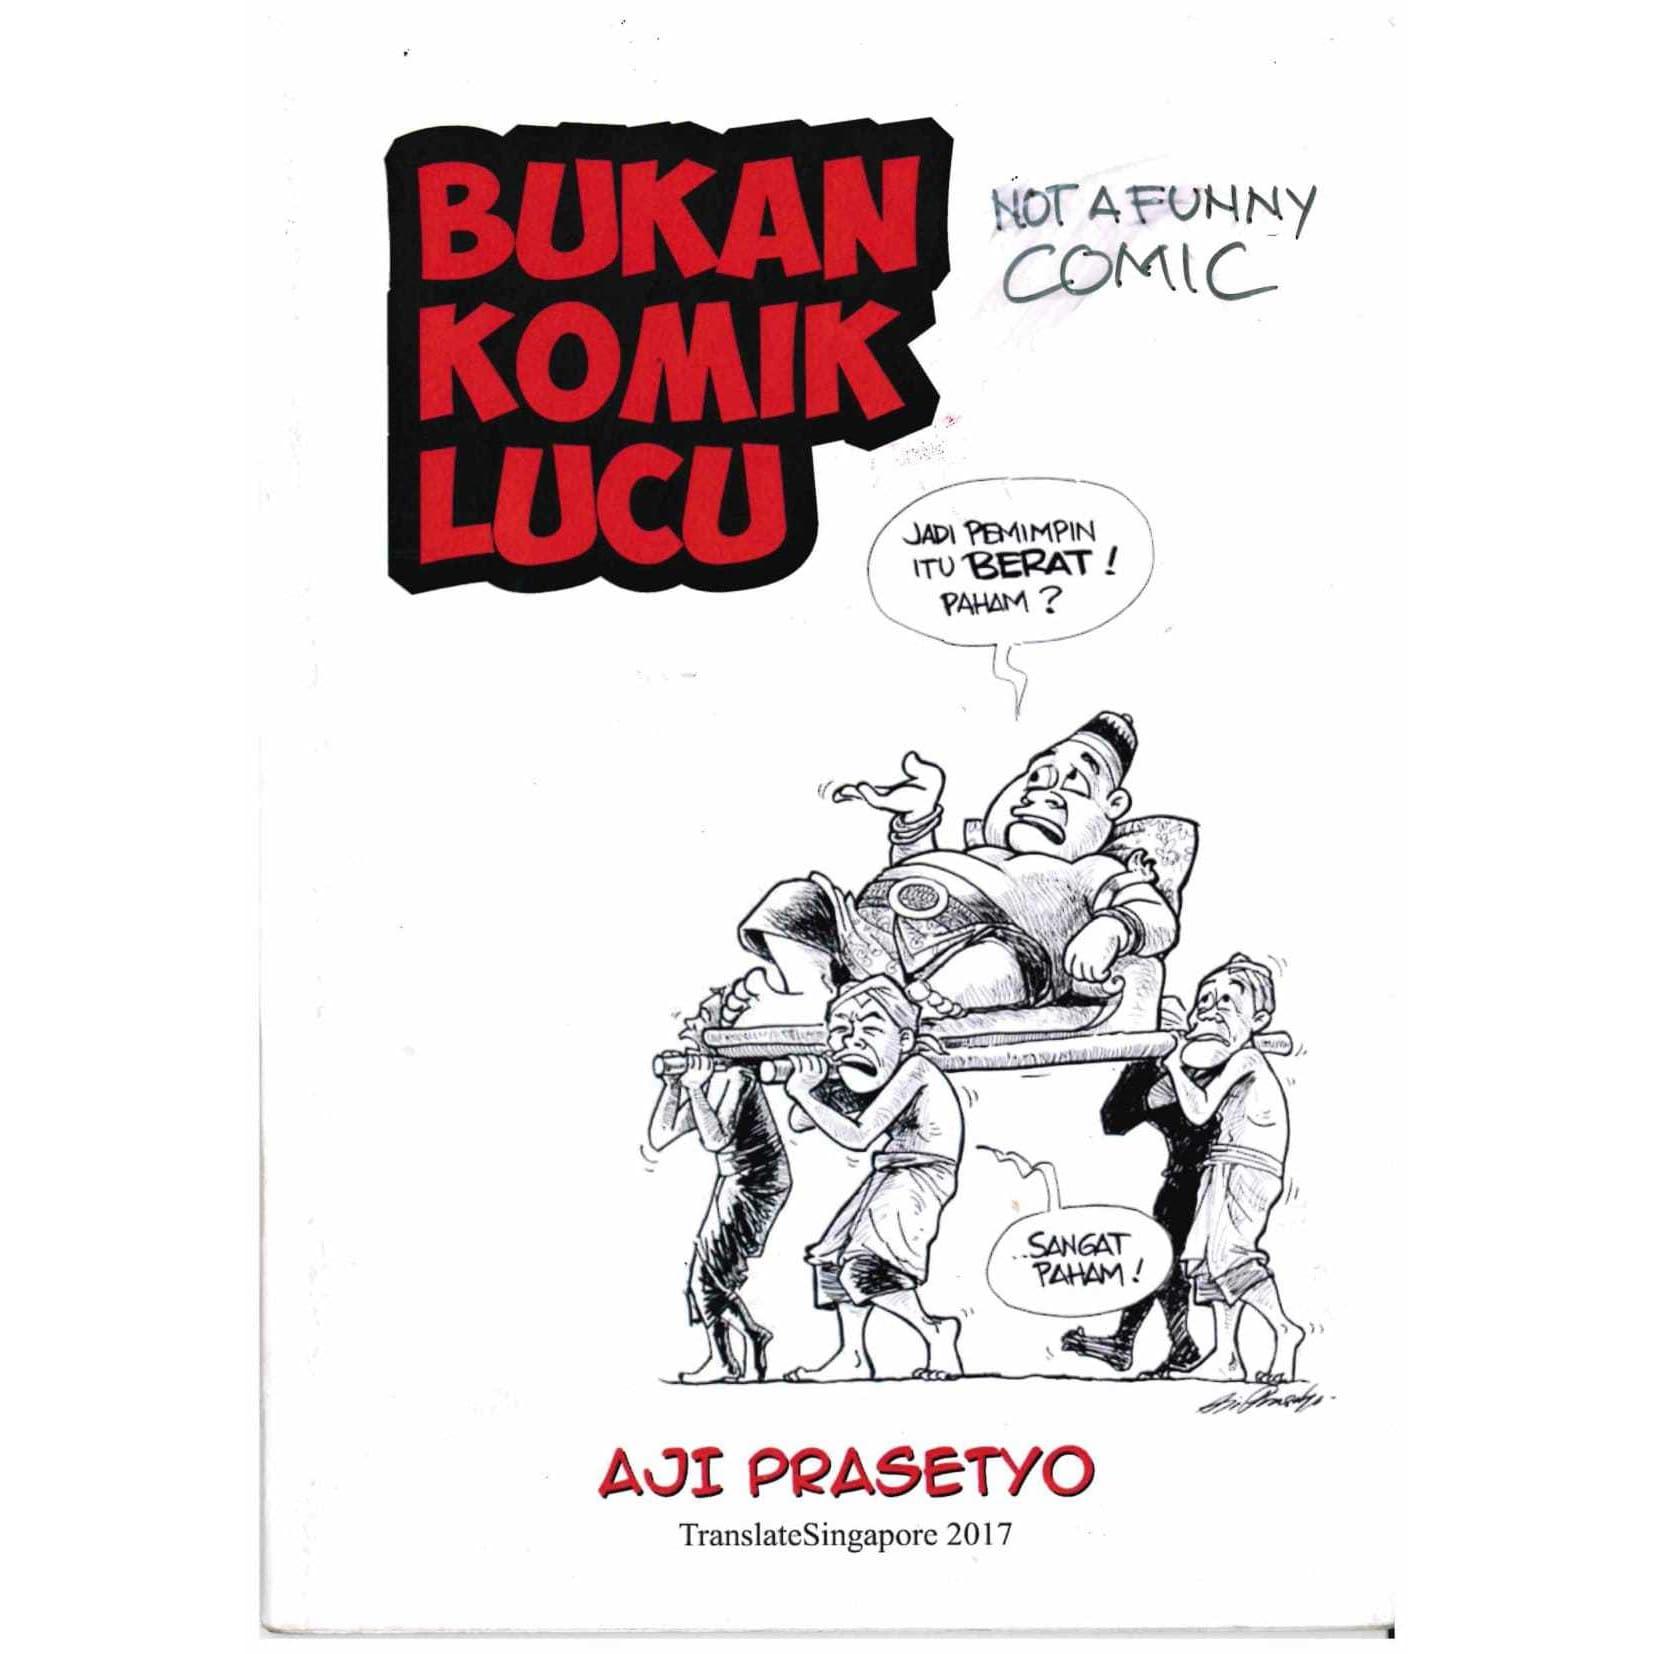 Bukan Komik Lucu By Aji Prasetyo